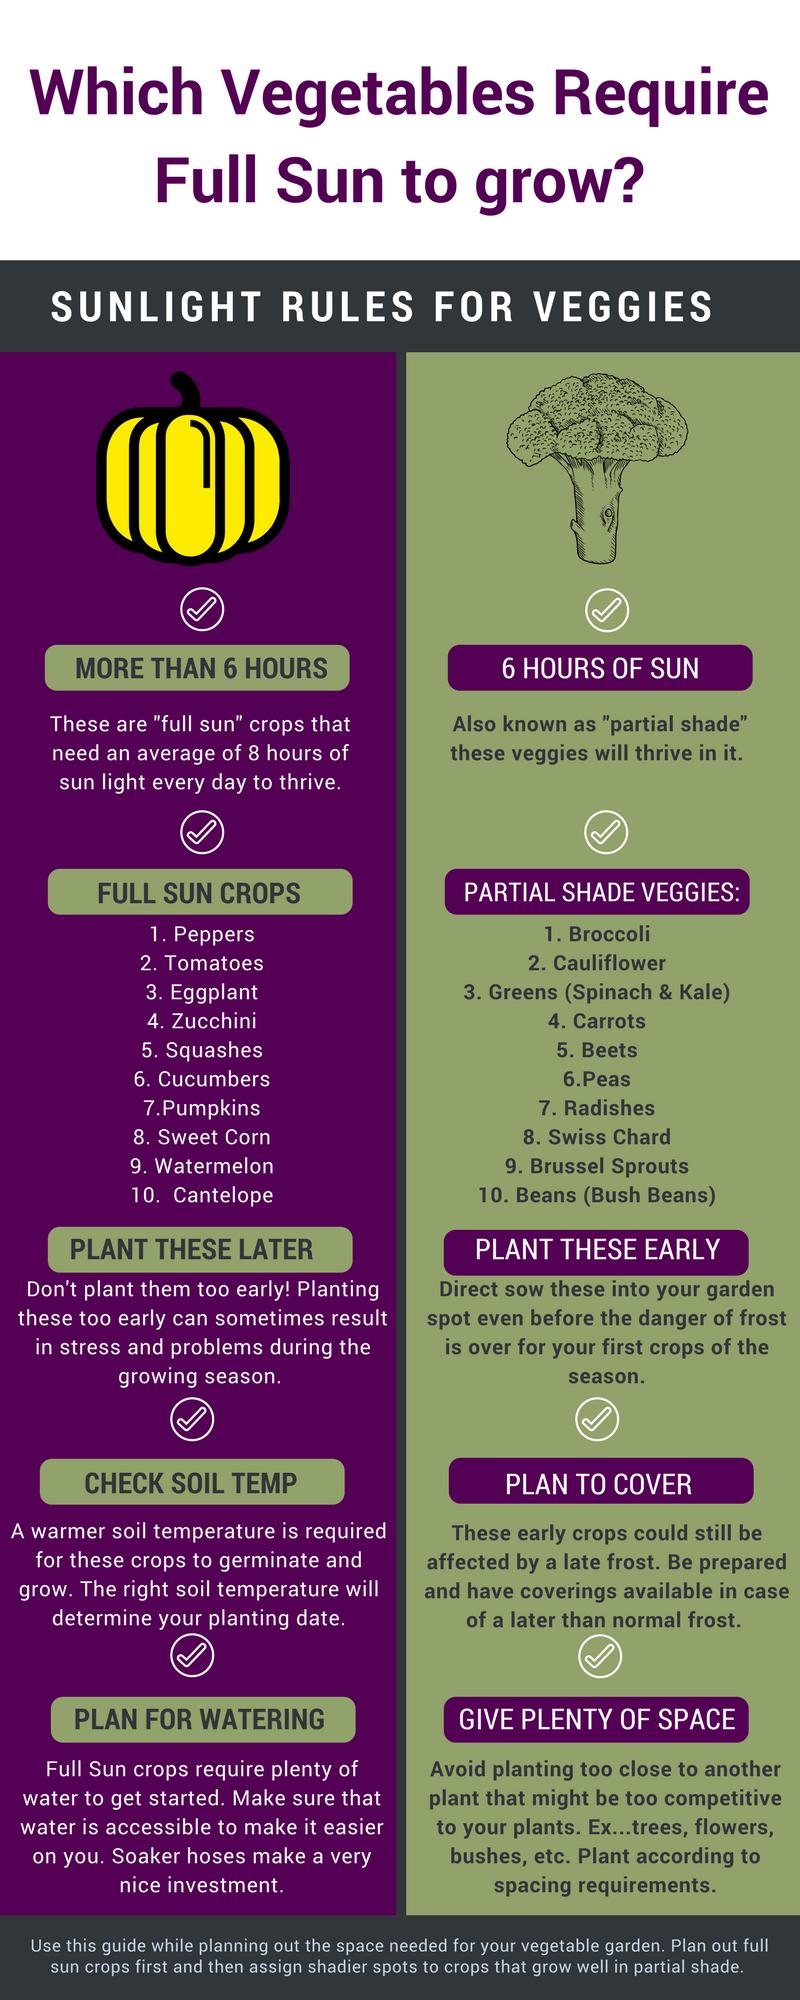 Simple Vegetable Garden Layout Plans & Spacing Tips for Home Gardens – Vegetable garden planner